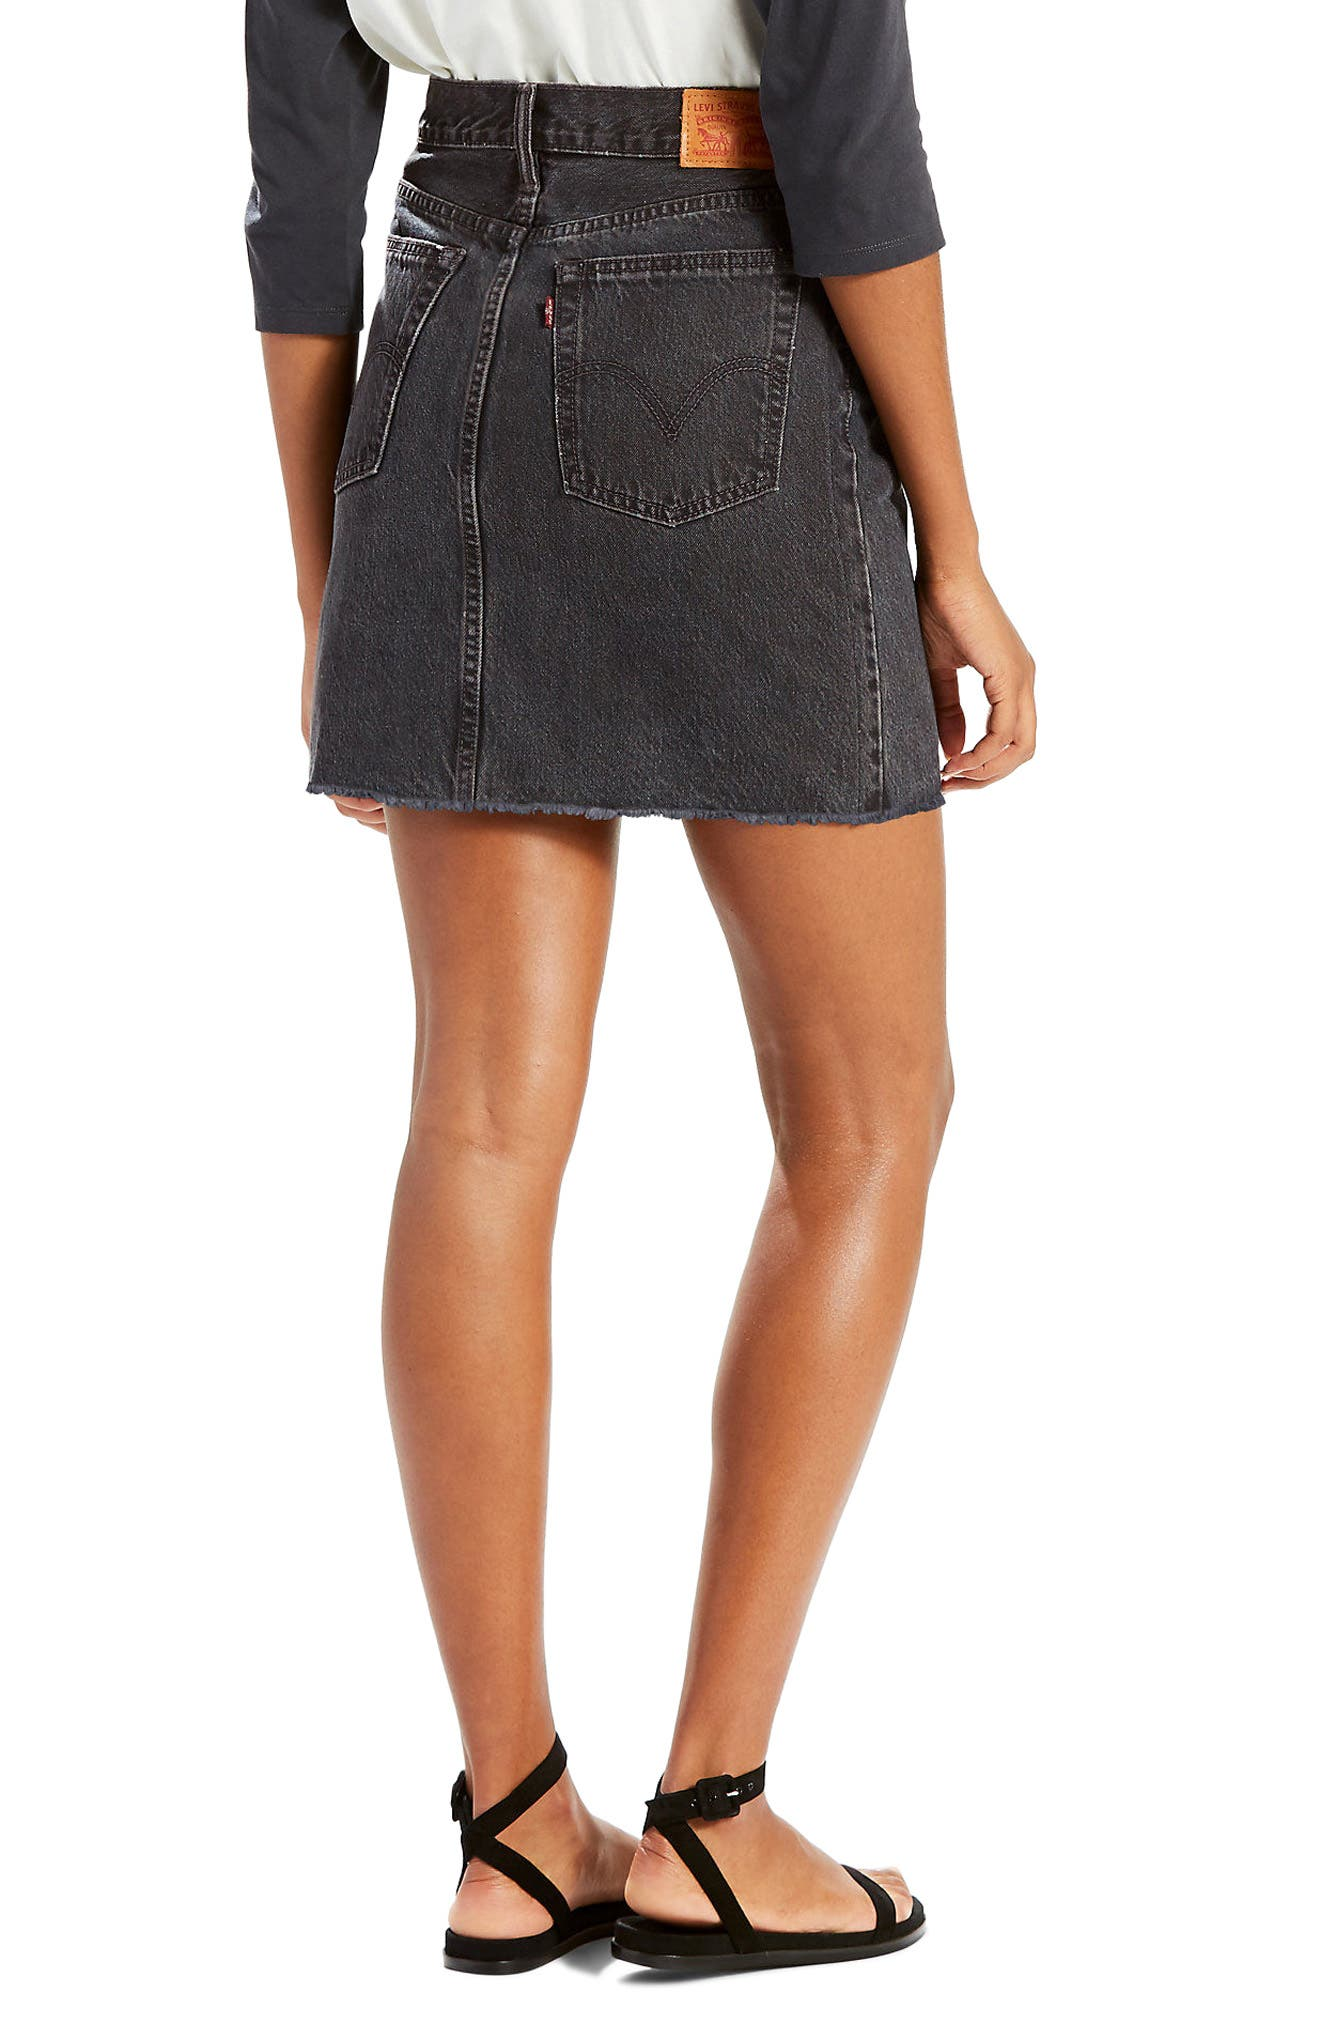 Everyday Denim Skirt,                             Alternate thumbnail 2, color,                             Mixed Tape Washed Black Denim